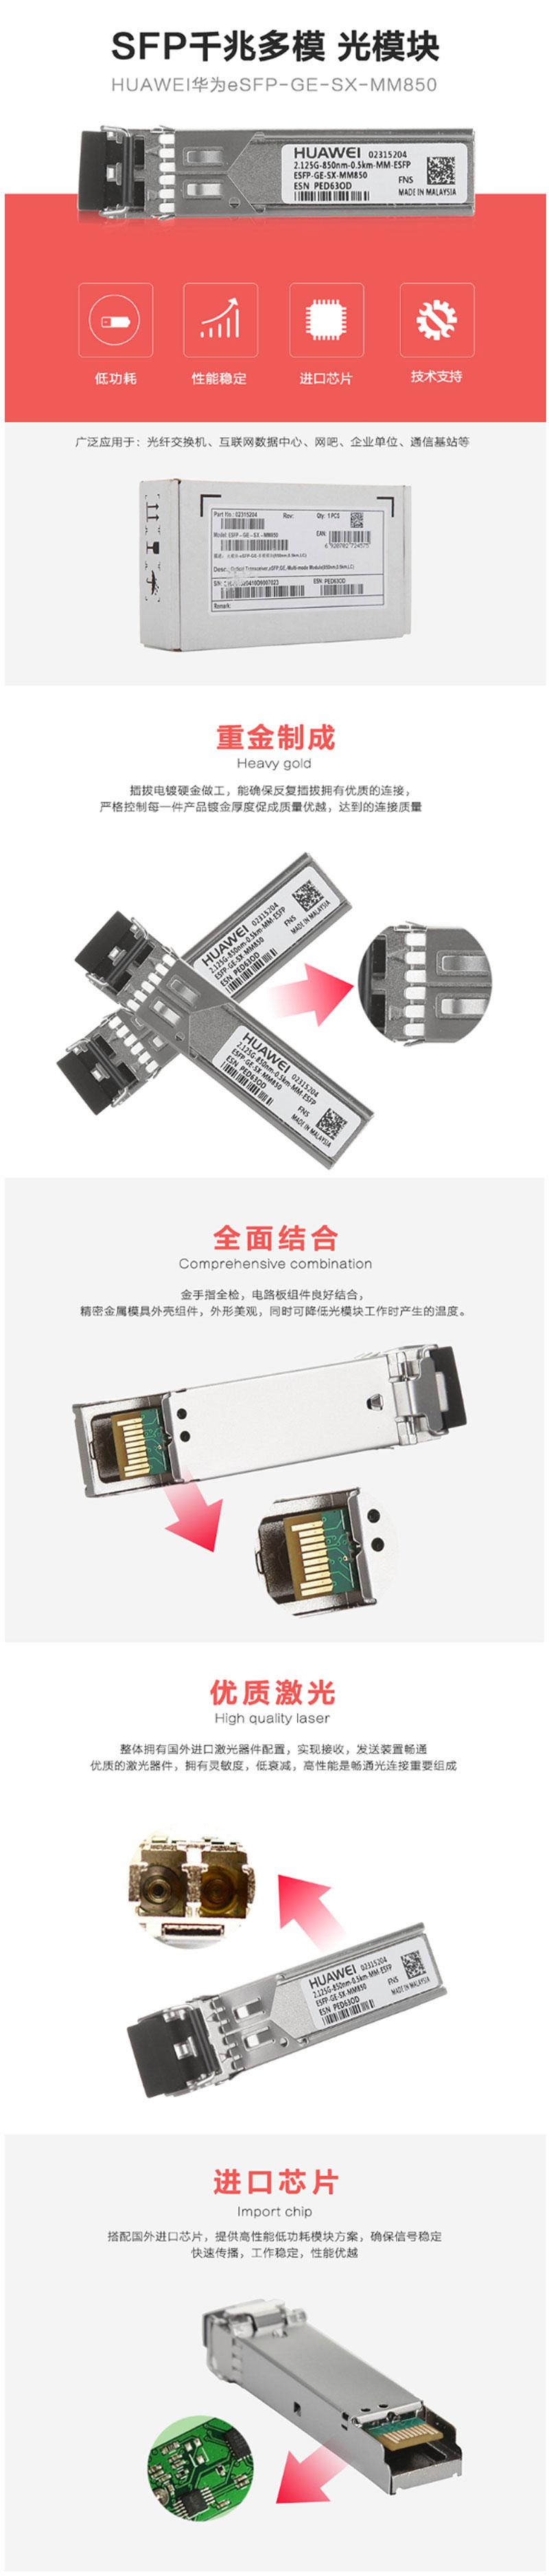 华为(HUAWEI)SFP-GE-SX-MM850